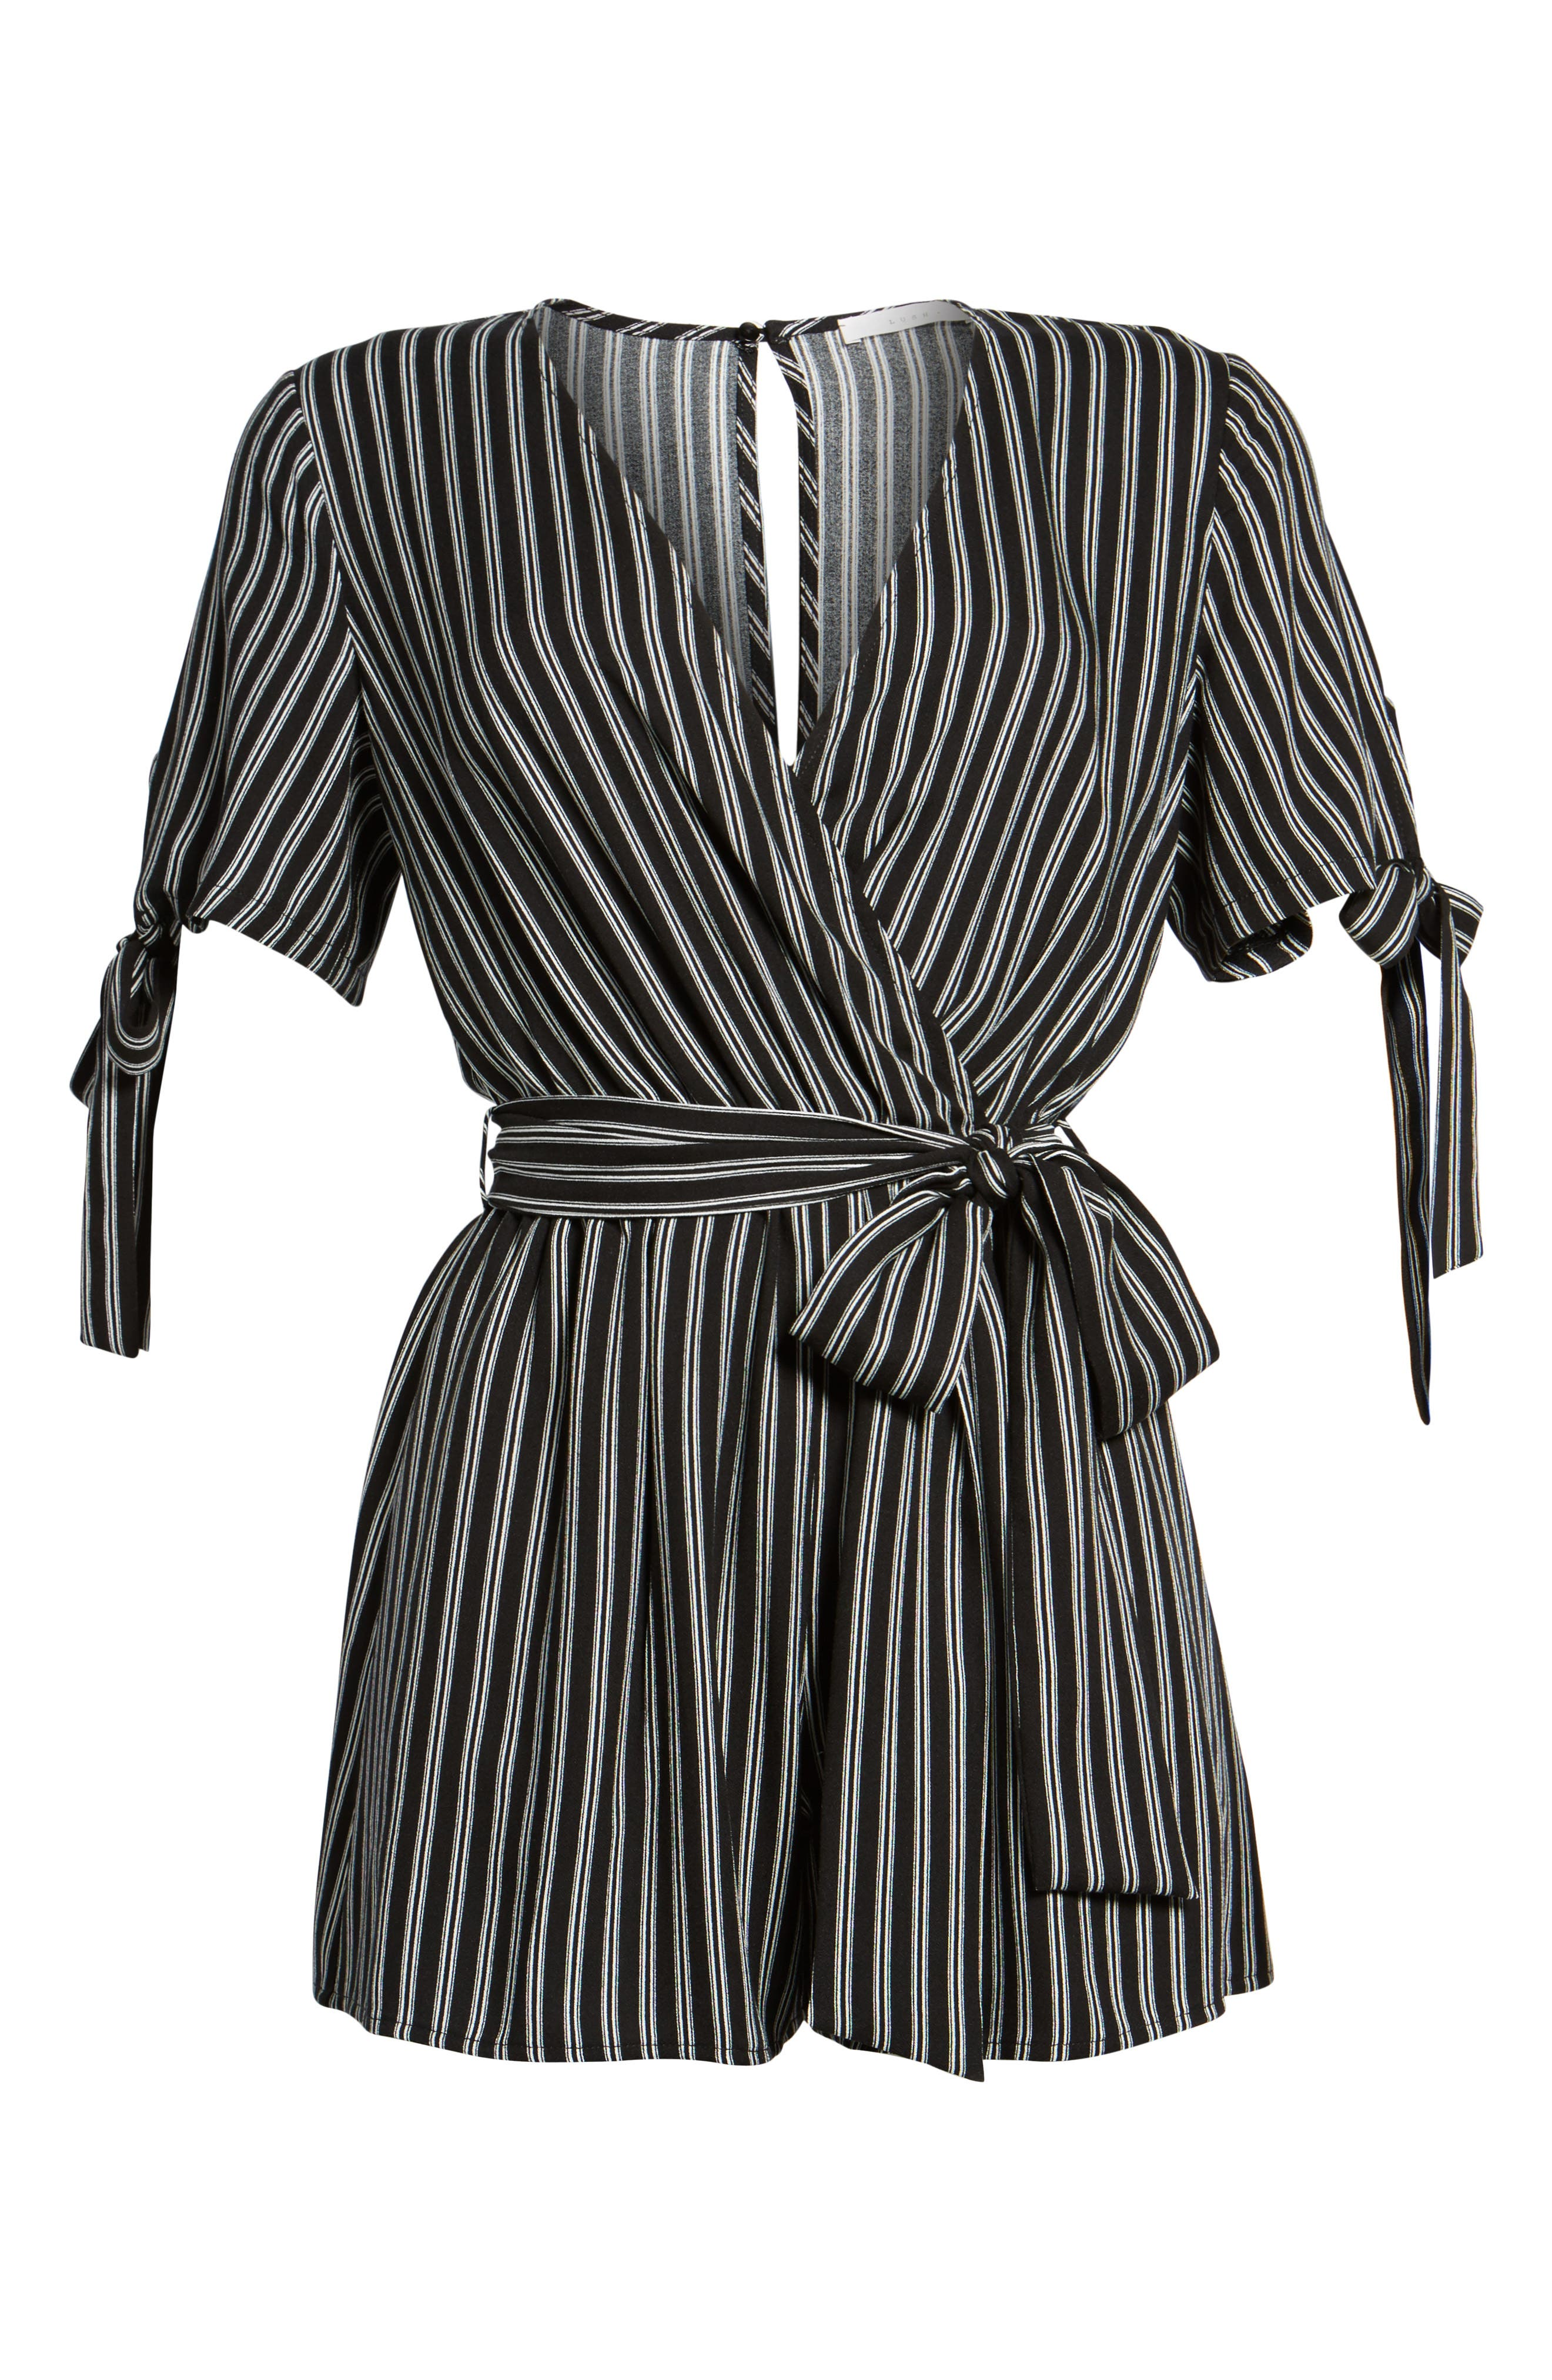 Faux Wrap Tie Sleeve Romper,                             Alternate thumbnail 6, color,                             Black White Stripe